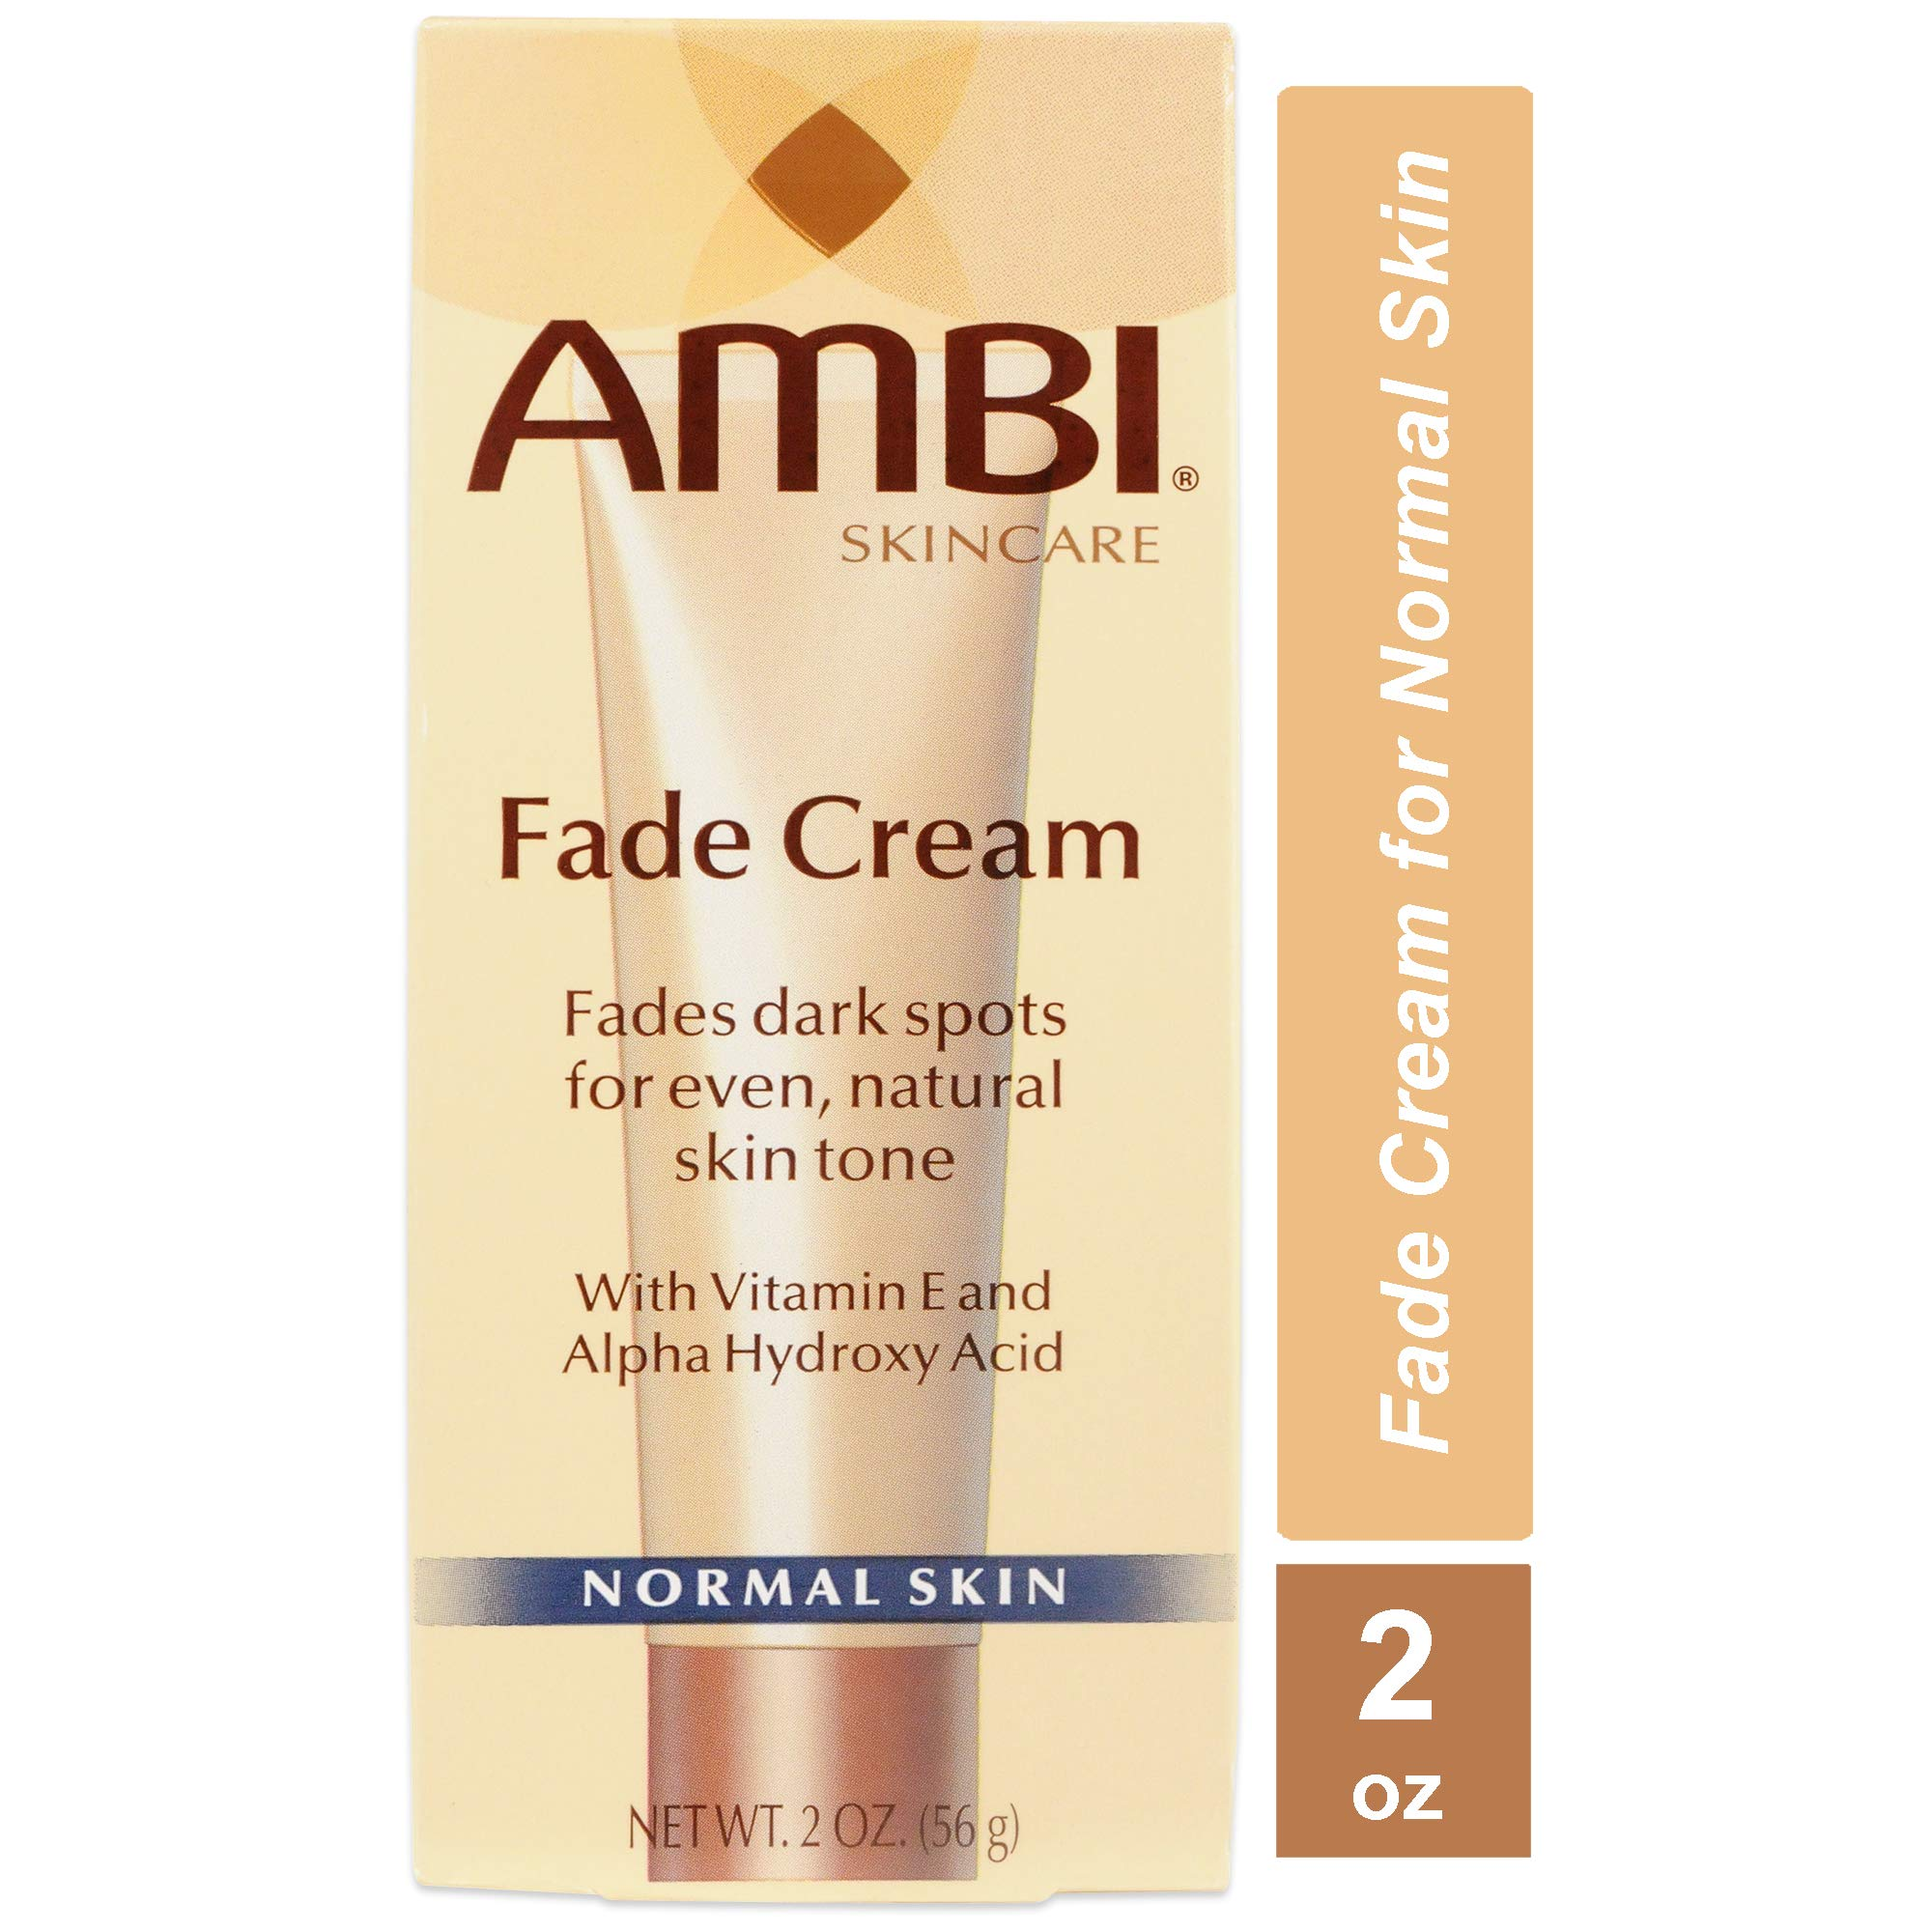 Ambi Skincare Fade Cream, Normal Skin, 2 oz